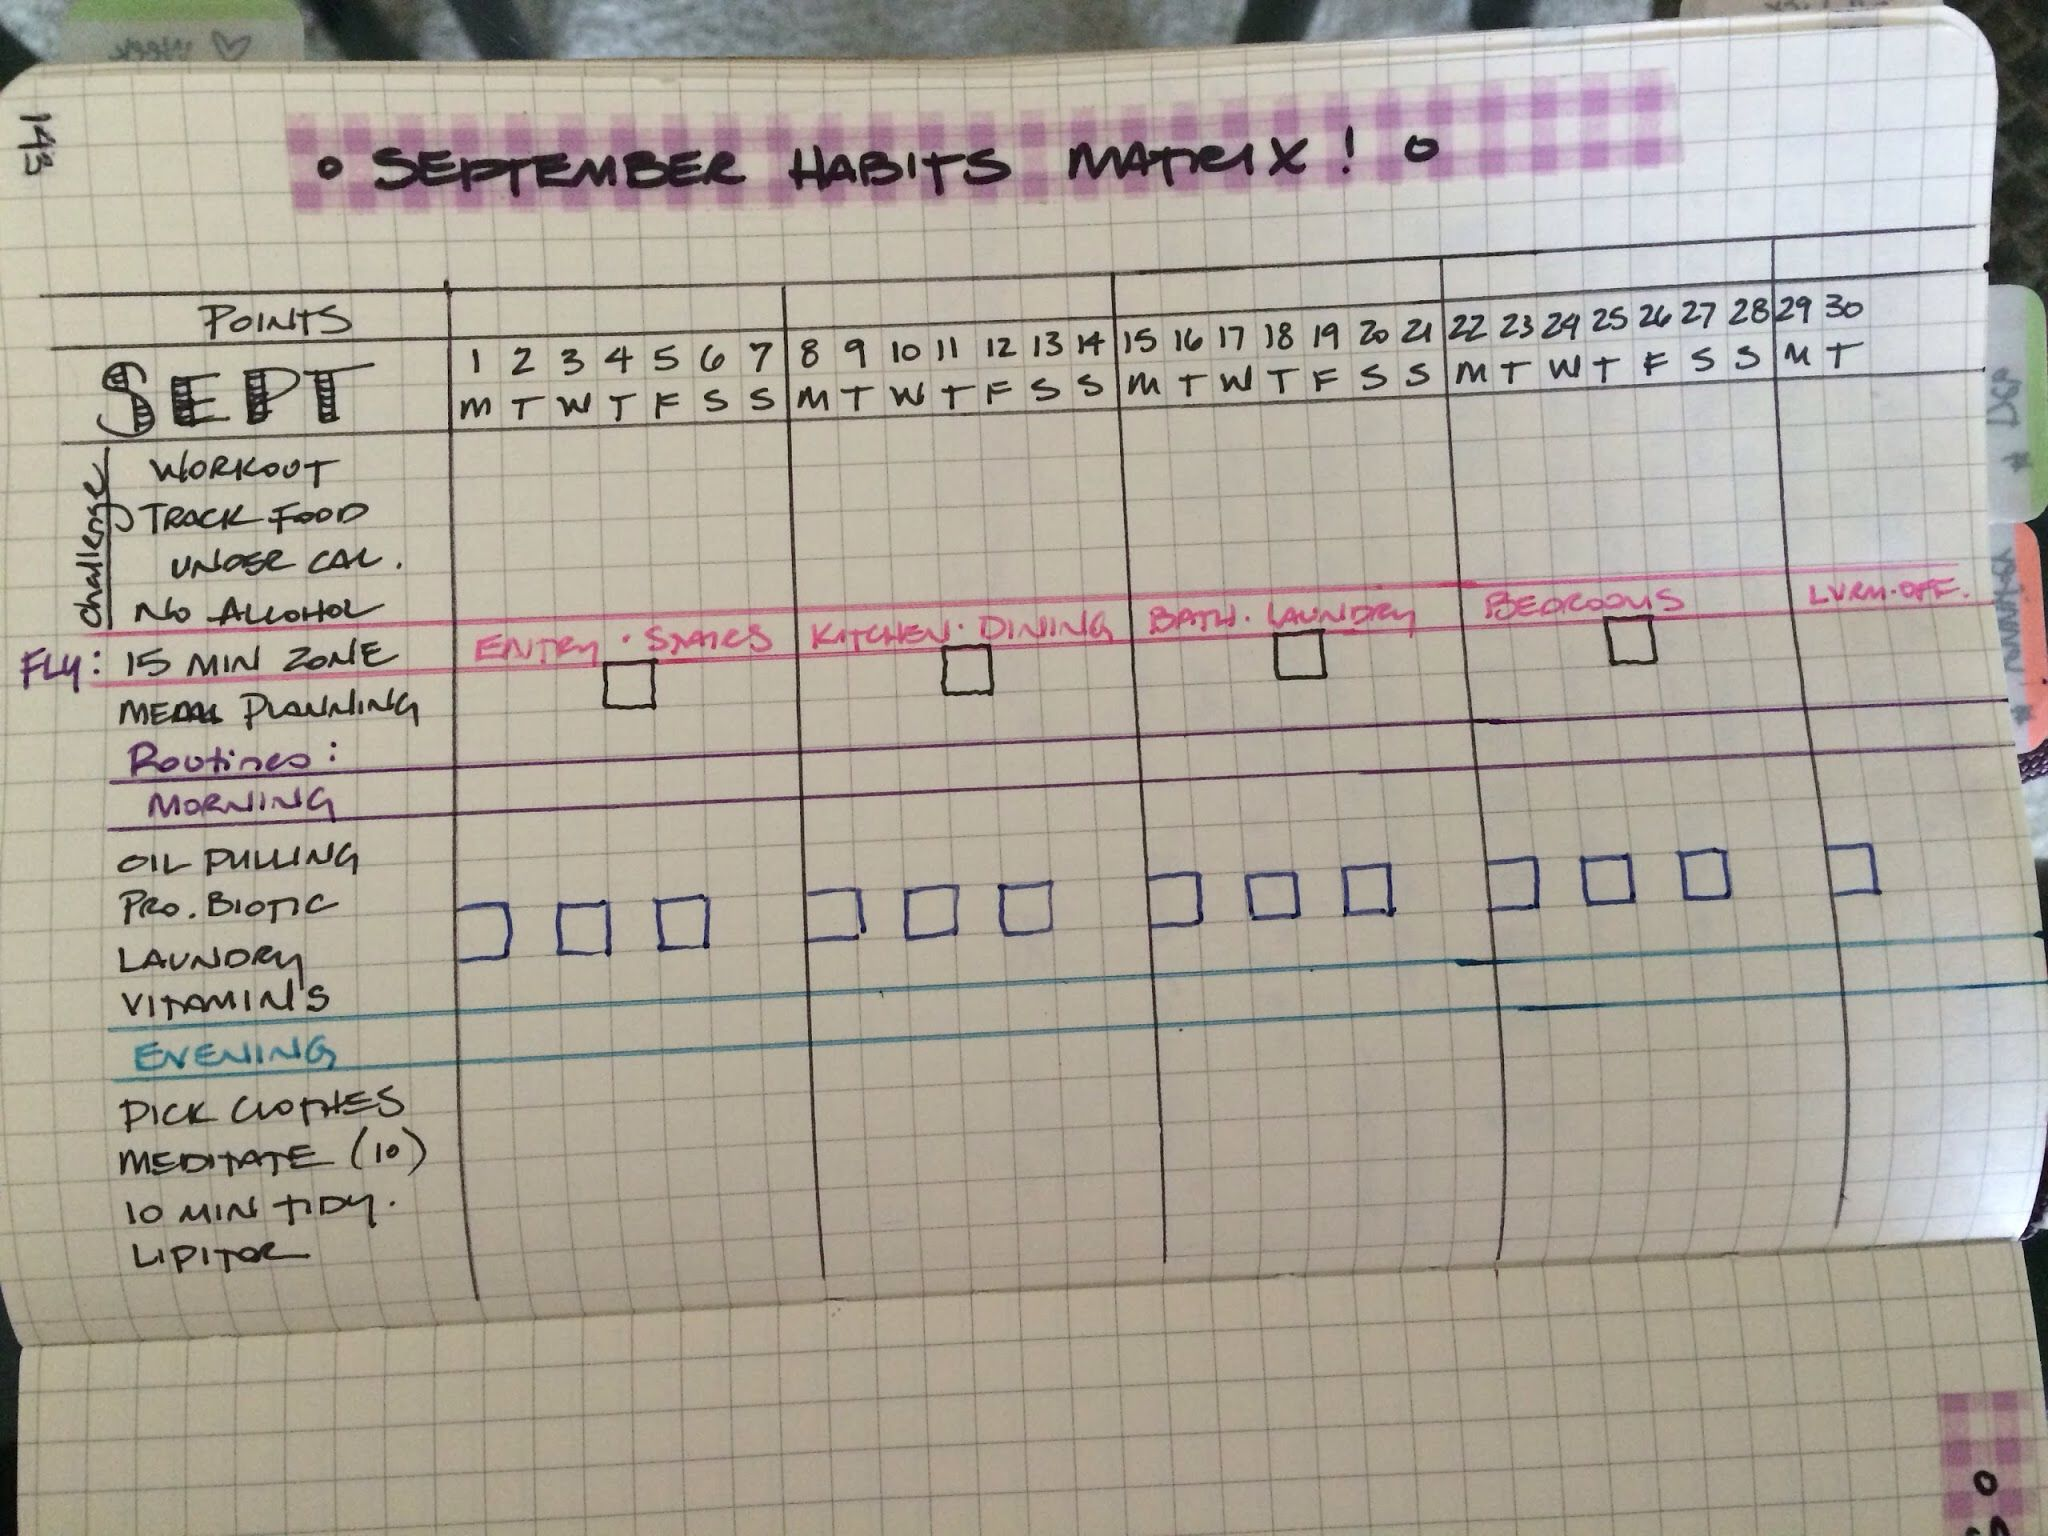 Monthly Habit Tracker Student Stationery Planner Agenda Journal To Do Checklist Chore